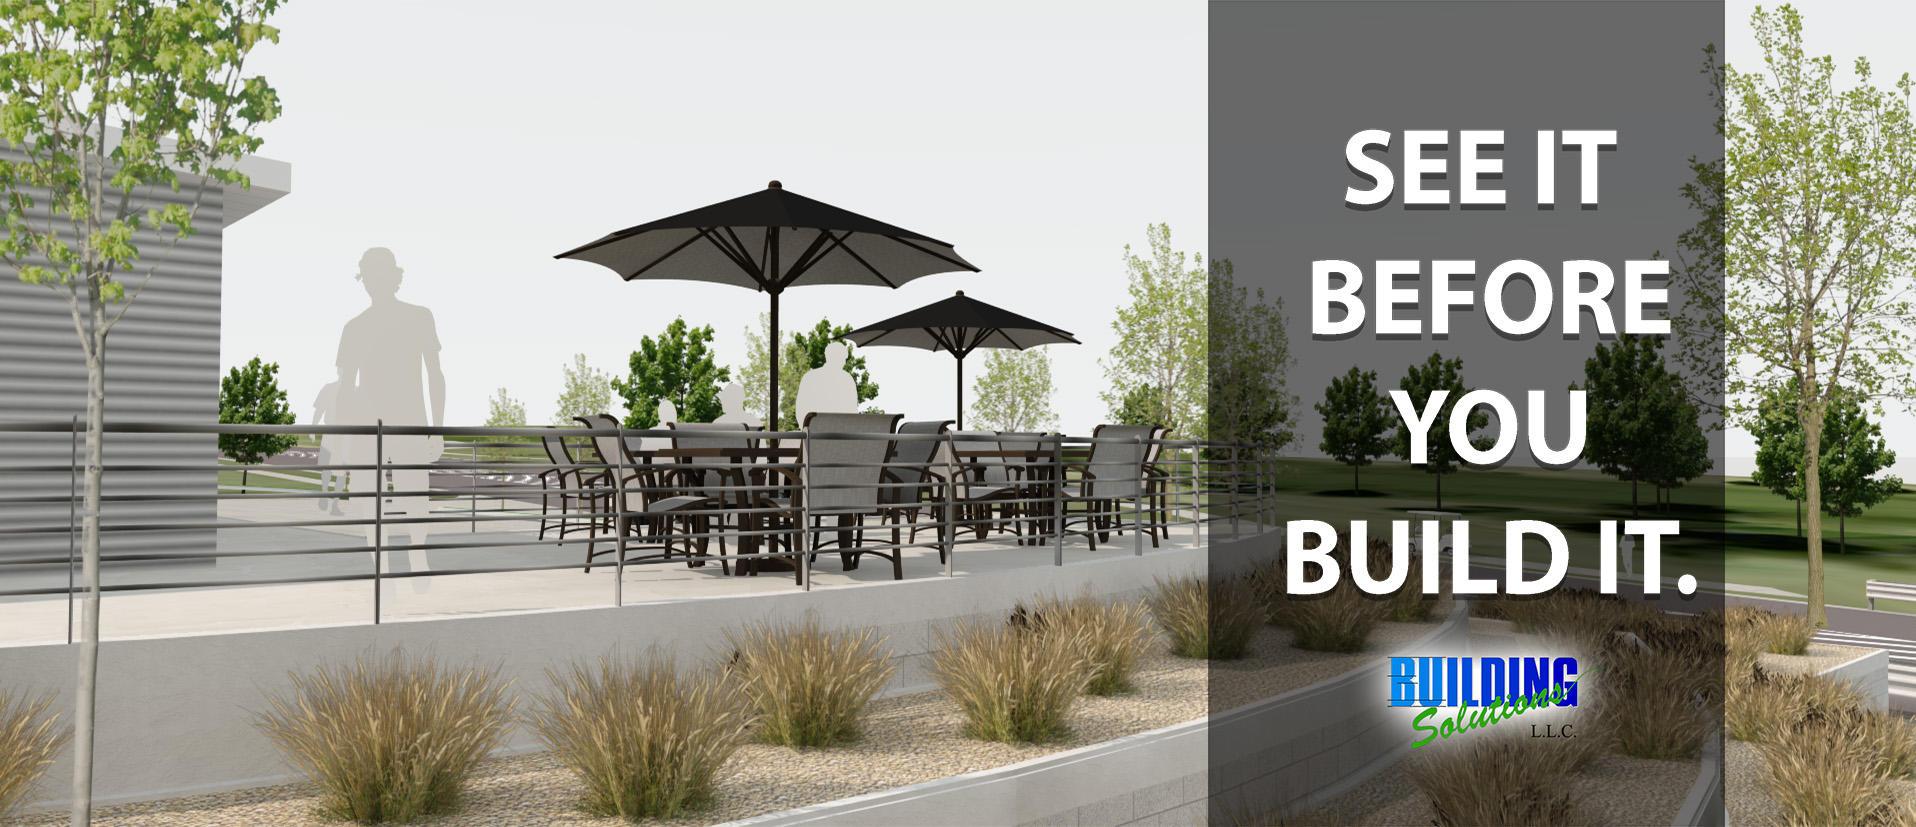 Building Solutions, LLC image 4